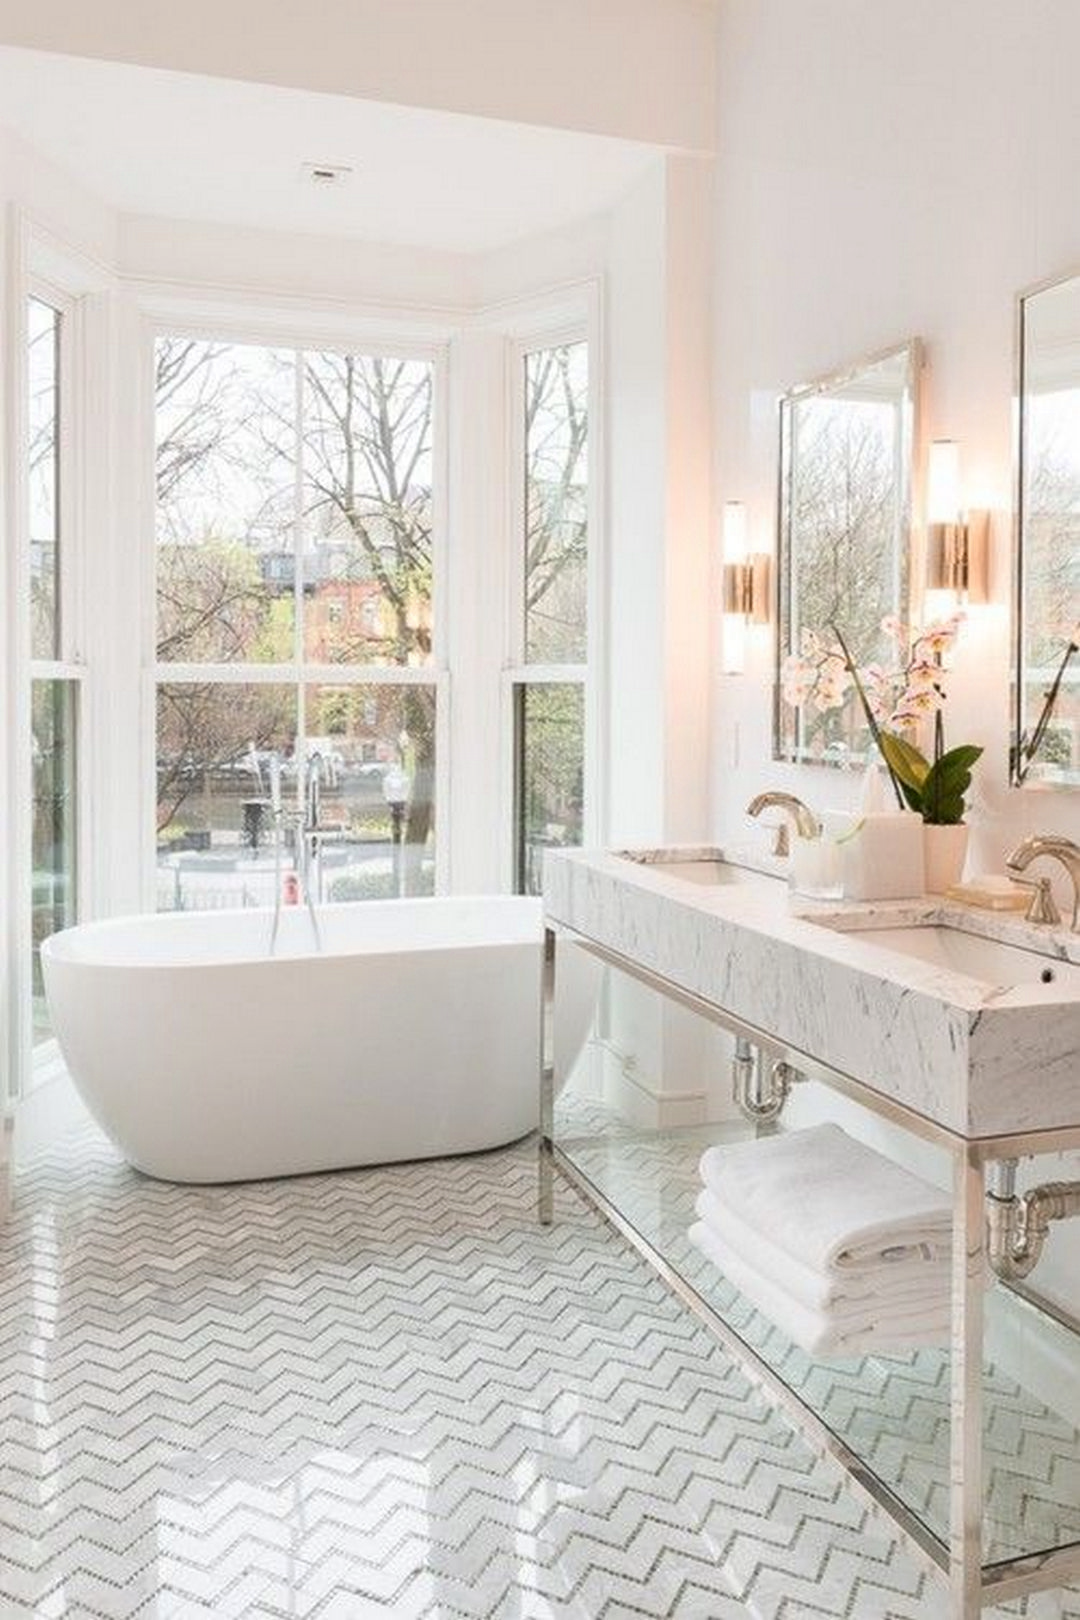 Superbe Modern Bathroom Interior Designs: 100 Fascinating Photos |